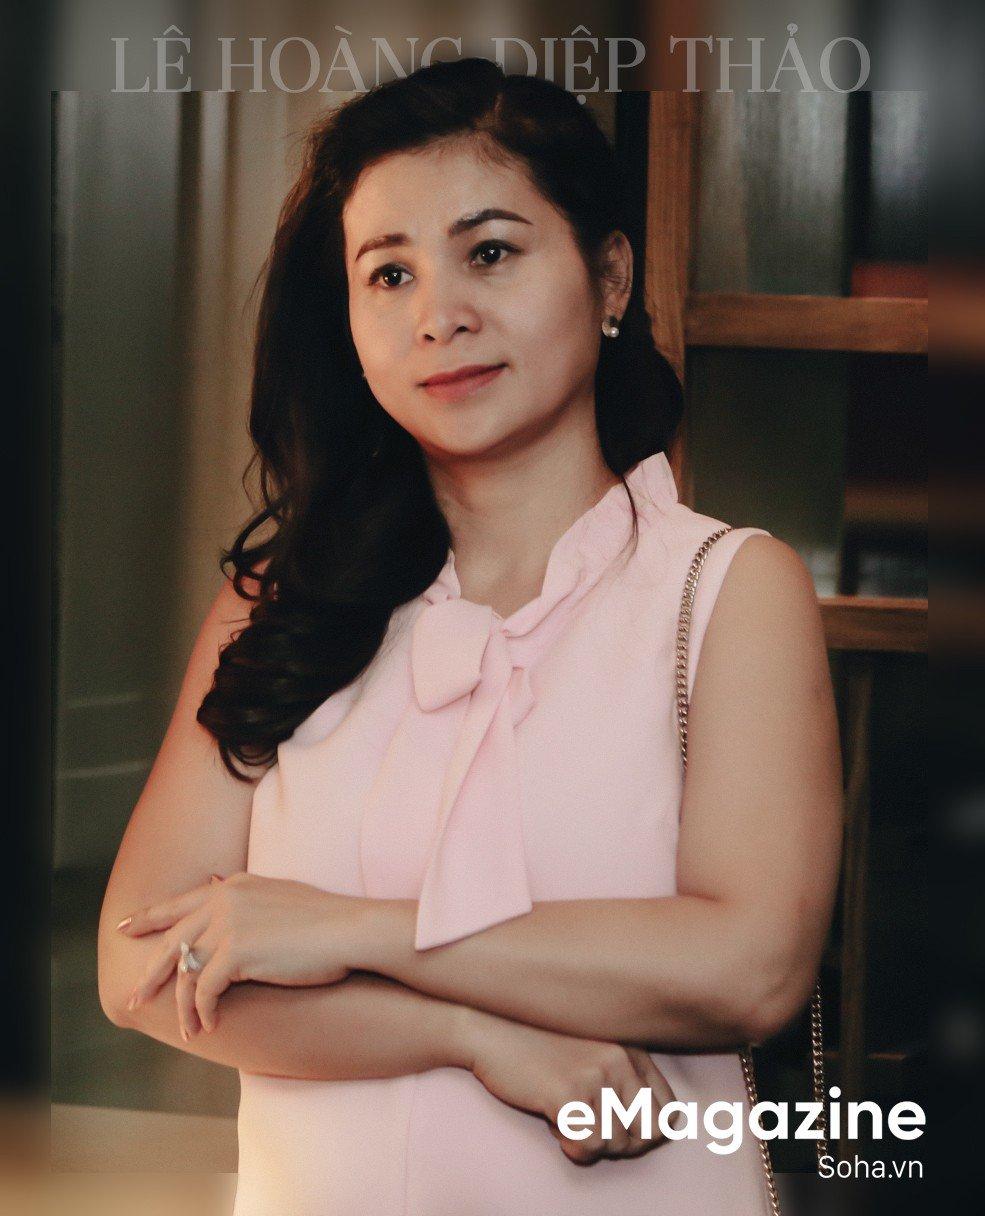 My nhan Le Hoang Diep Thao: '49 ngay nhin an da cuop di Dang Le Nguyen Vu tuyet voi cua toi' hinh anh 4